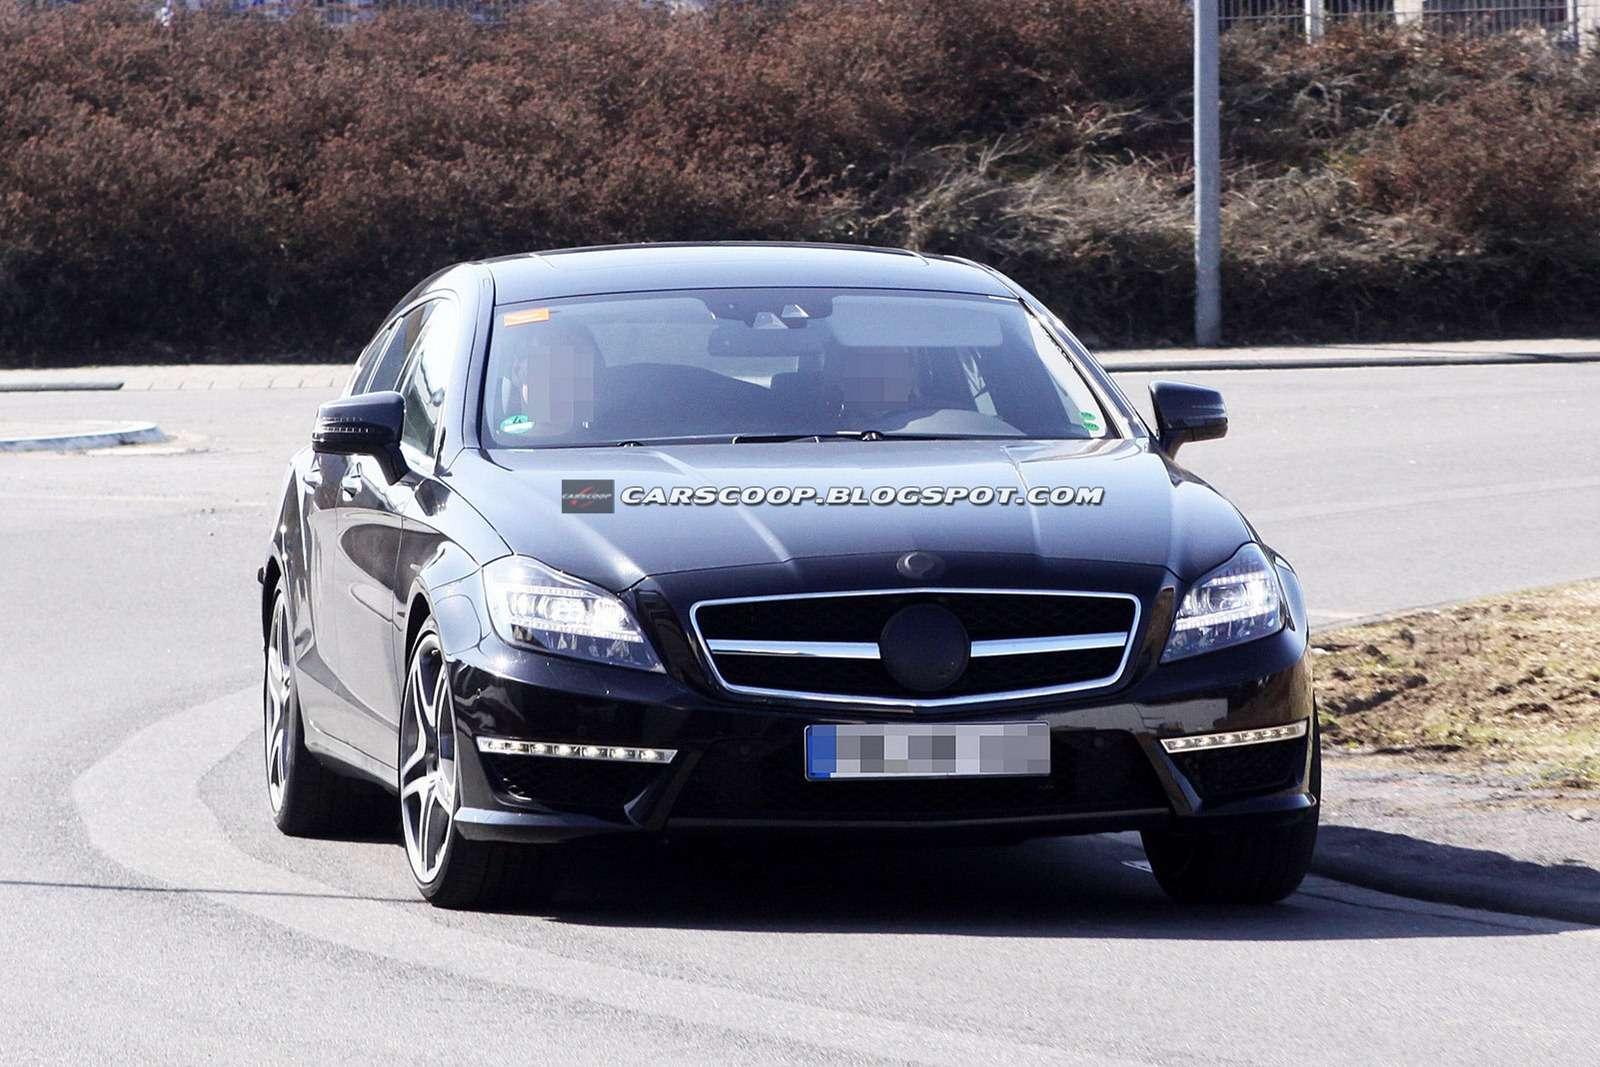 2013 Mercedes CLS Shooting Brake